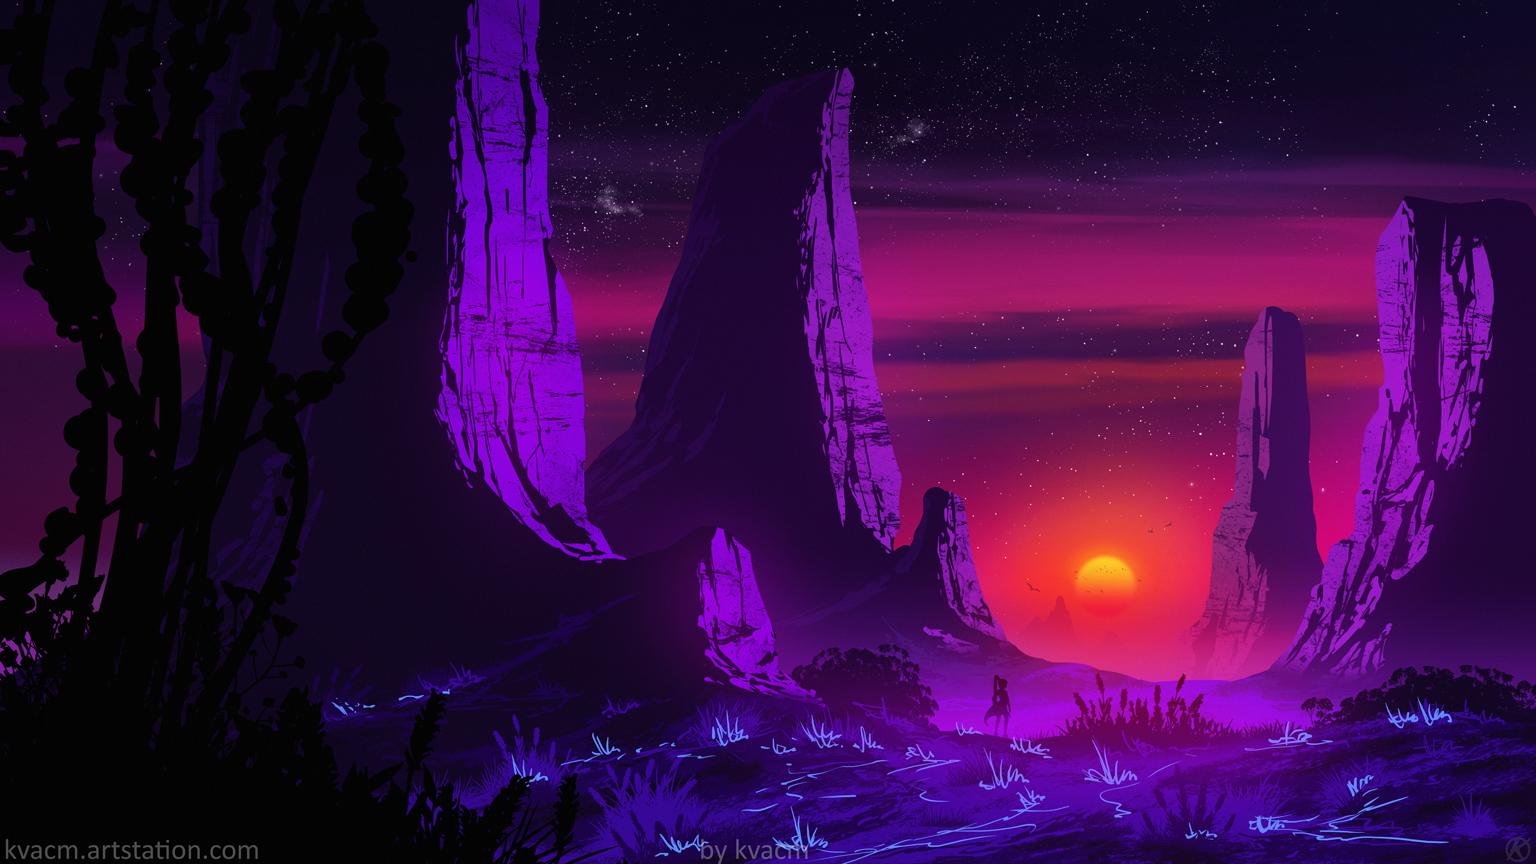 Kvacm Digital Art Illustration Sunset Rock Formation Night Stars Sky Mountains 1536x864